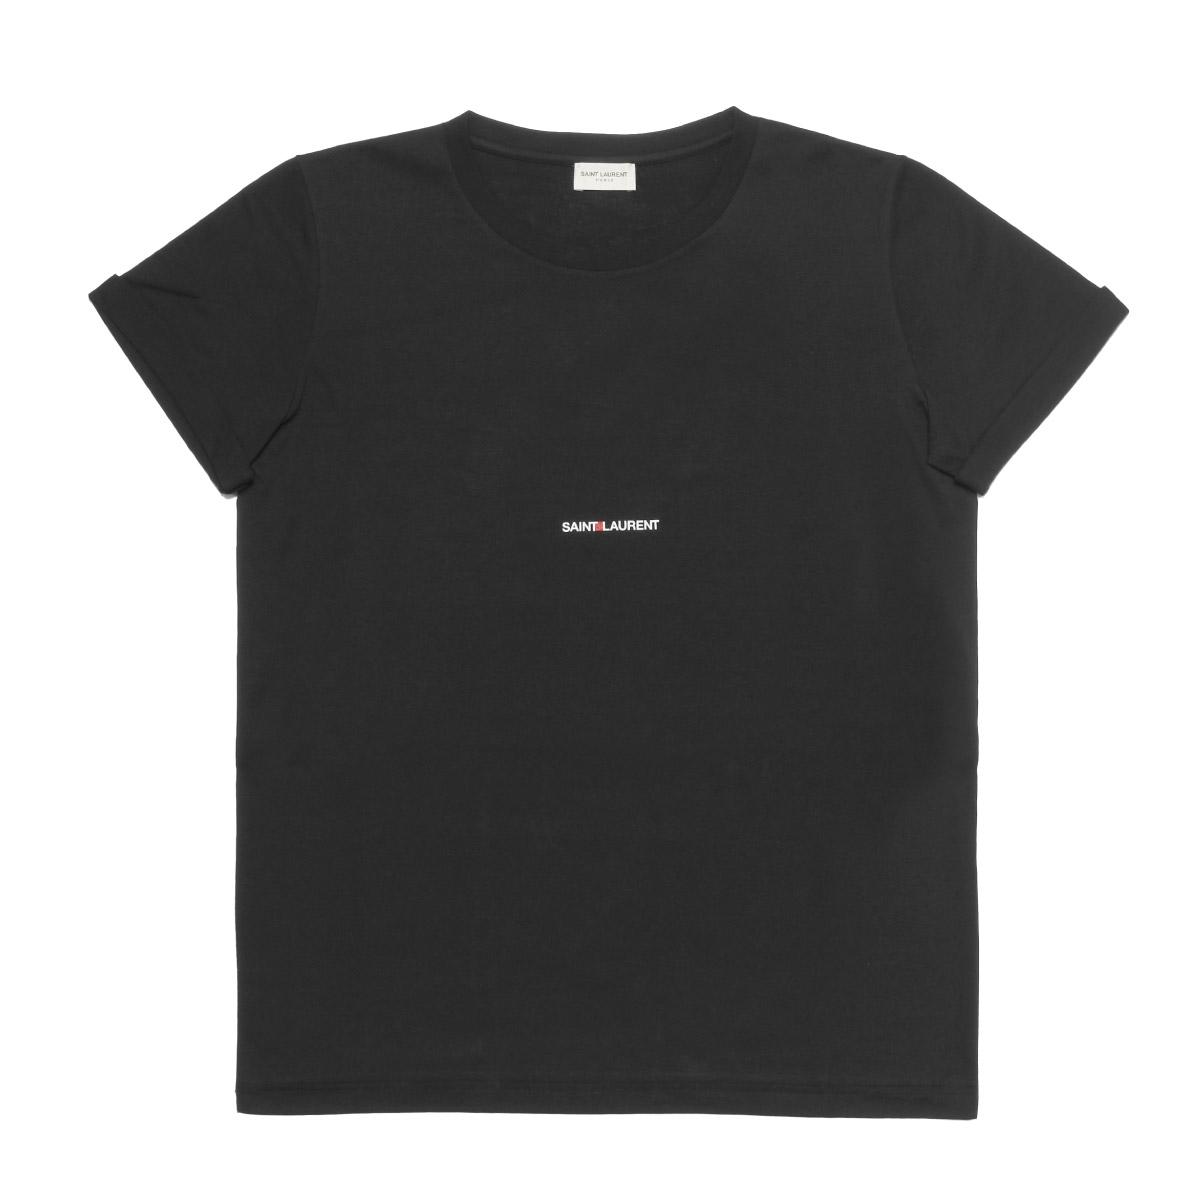 8a1fc606563dd9 464572 Saint-Laurent SAINT LAURENT T-shirt men YB2DQ 1000 short sleeves T-  ...